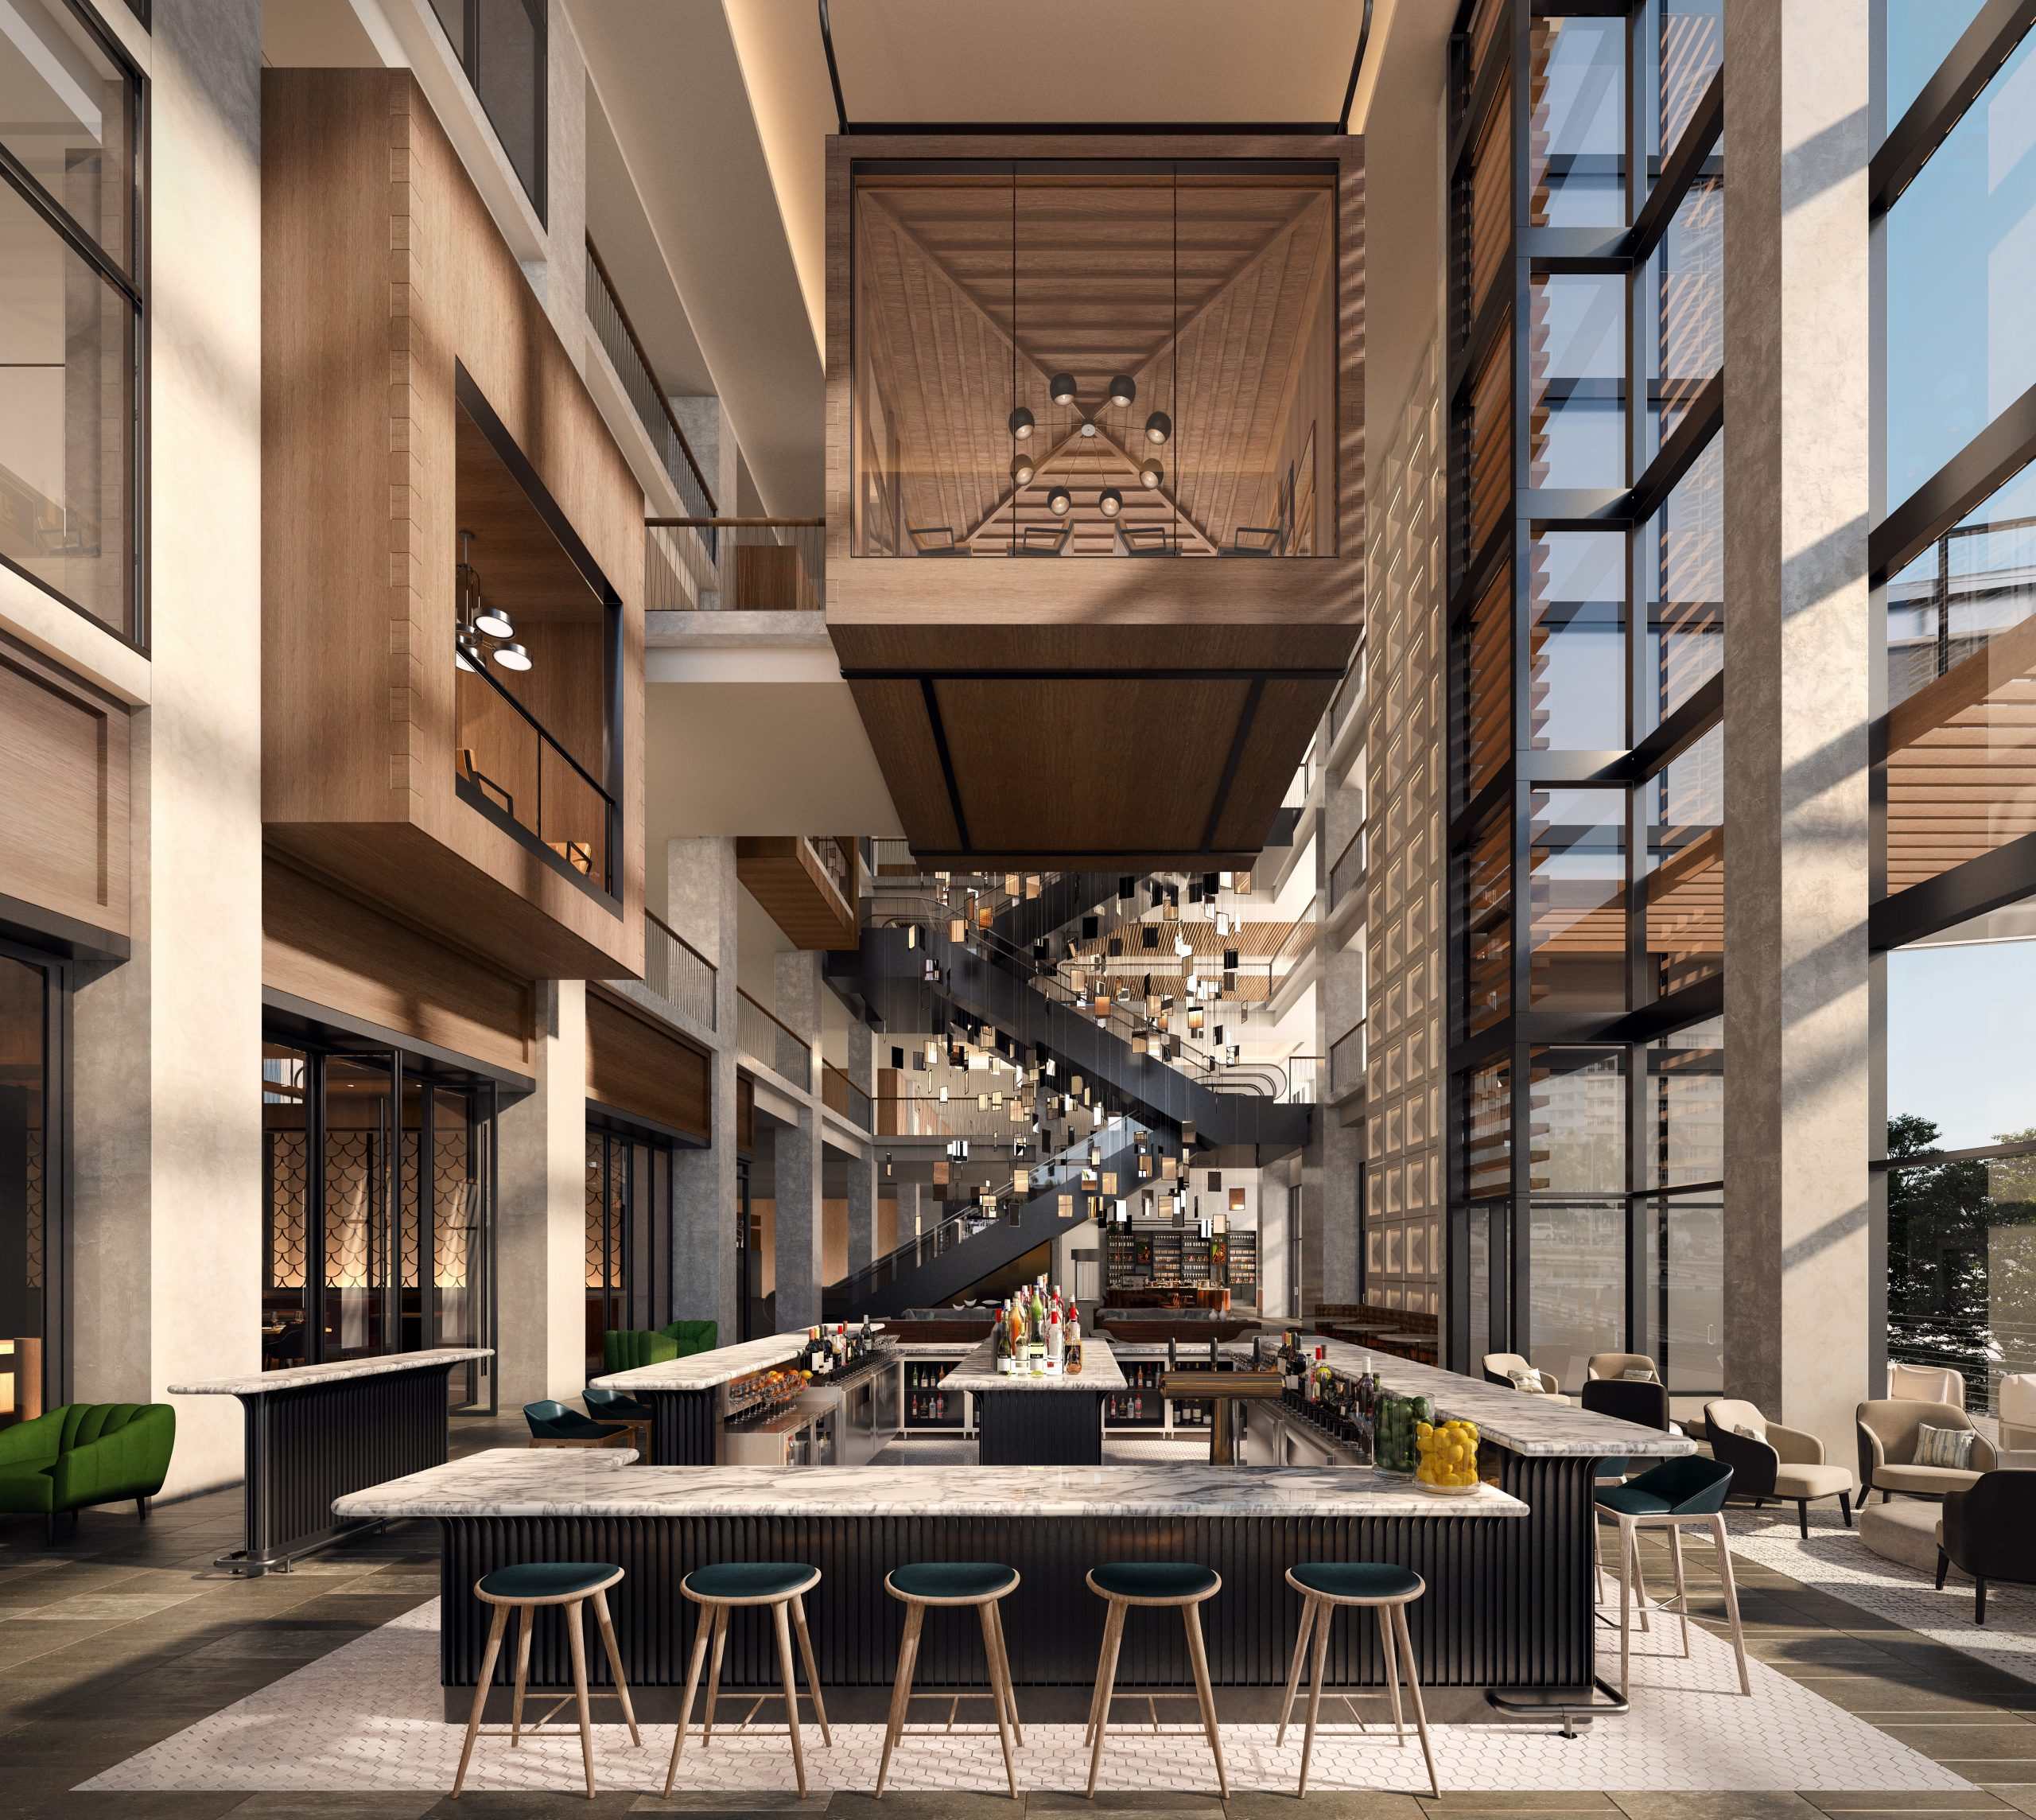 JW Marriott Tampa Atrium. Courtesy of Strategic Property Partners.